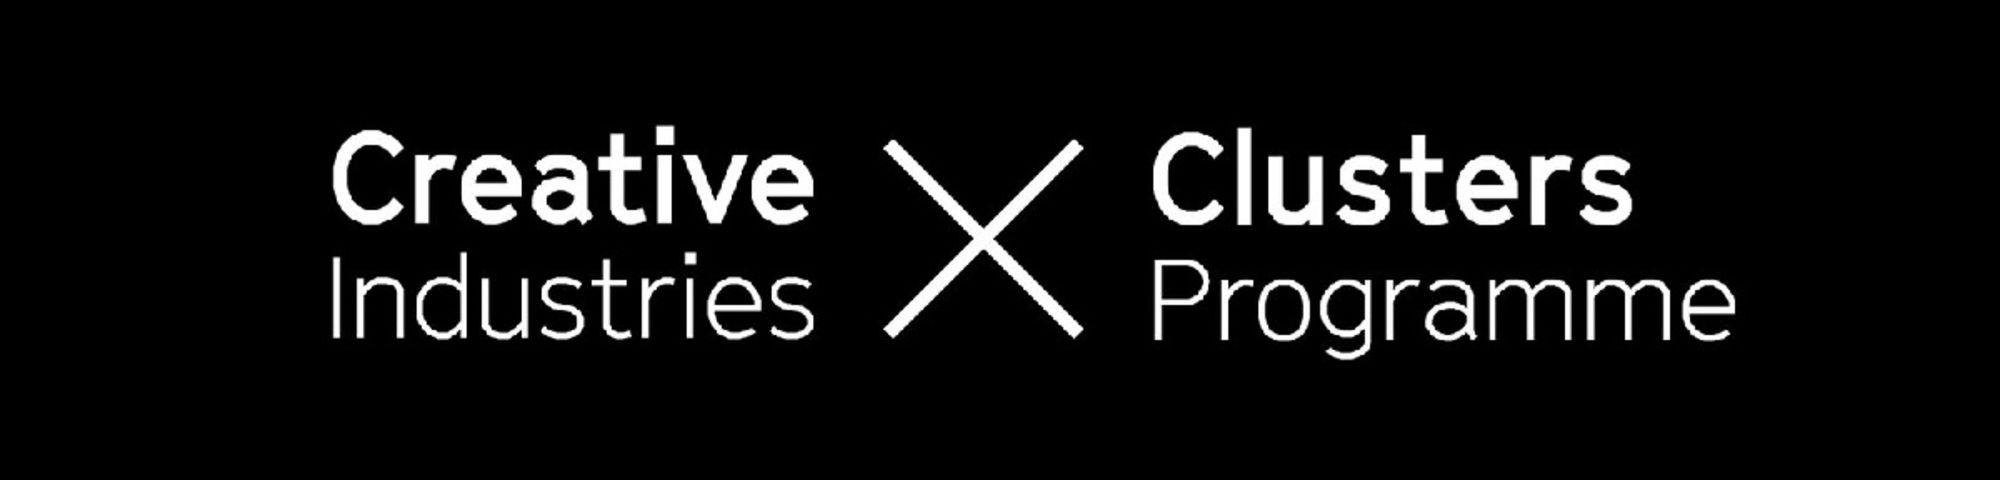 Creative Industries Cluster Programme v2